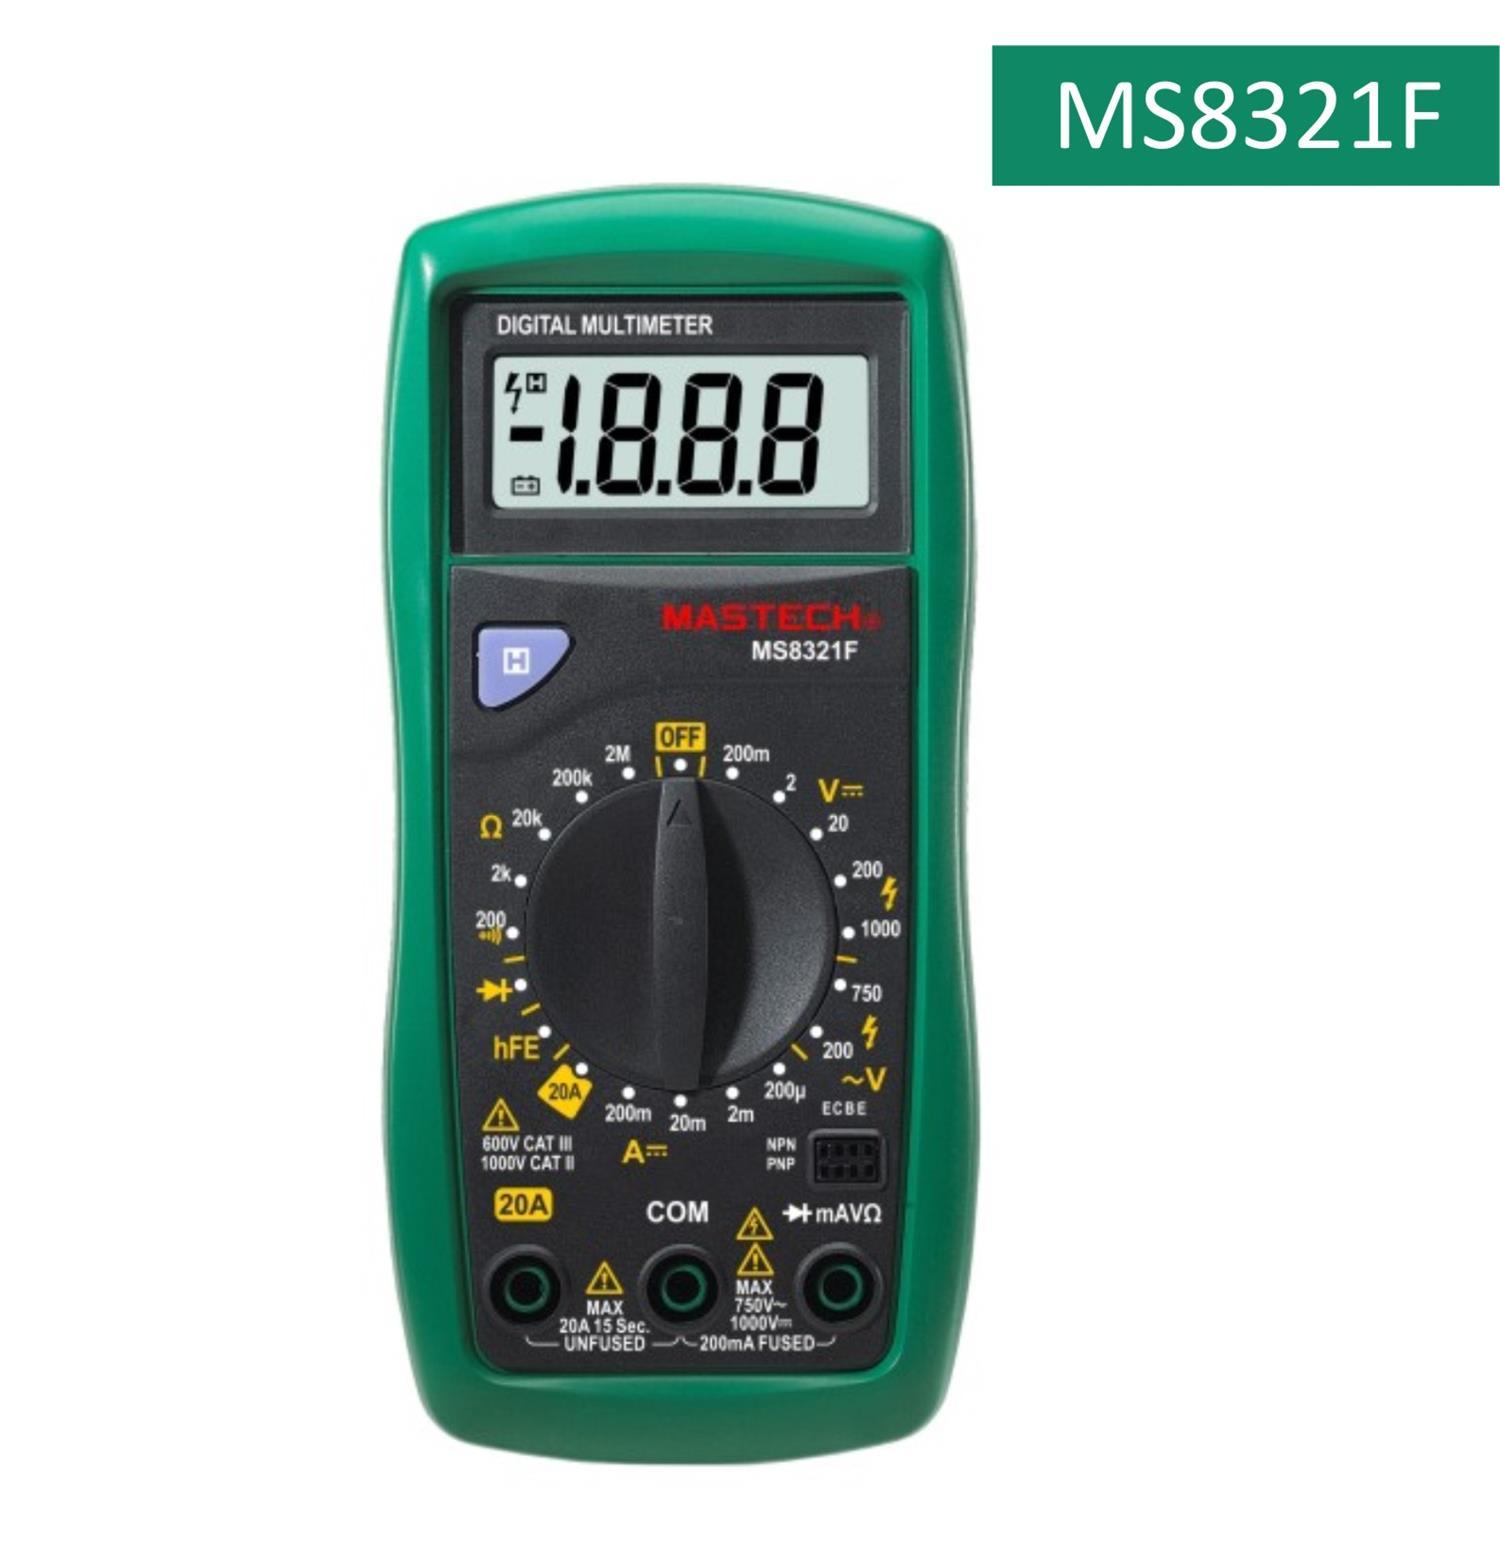 MS 8321F